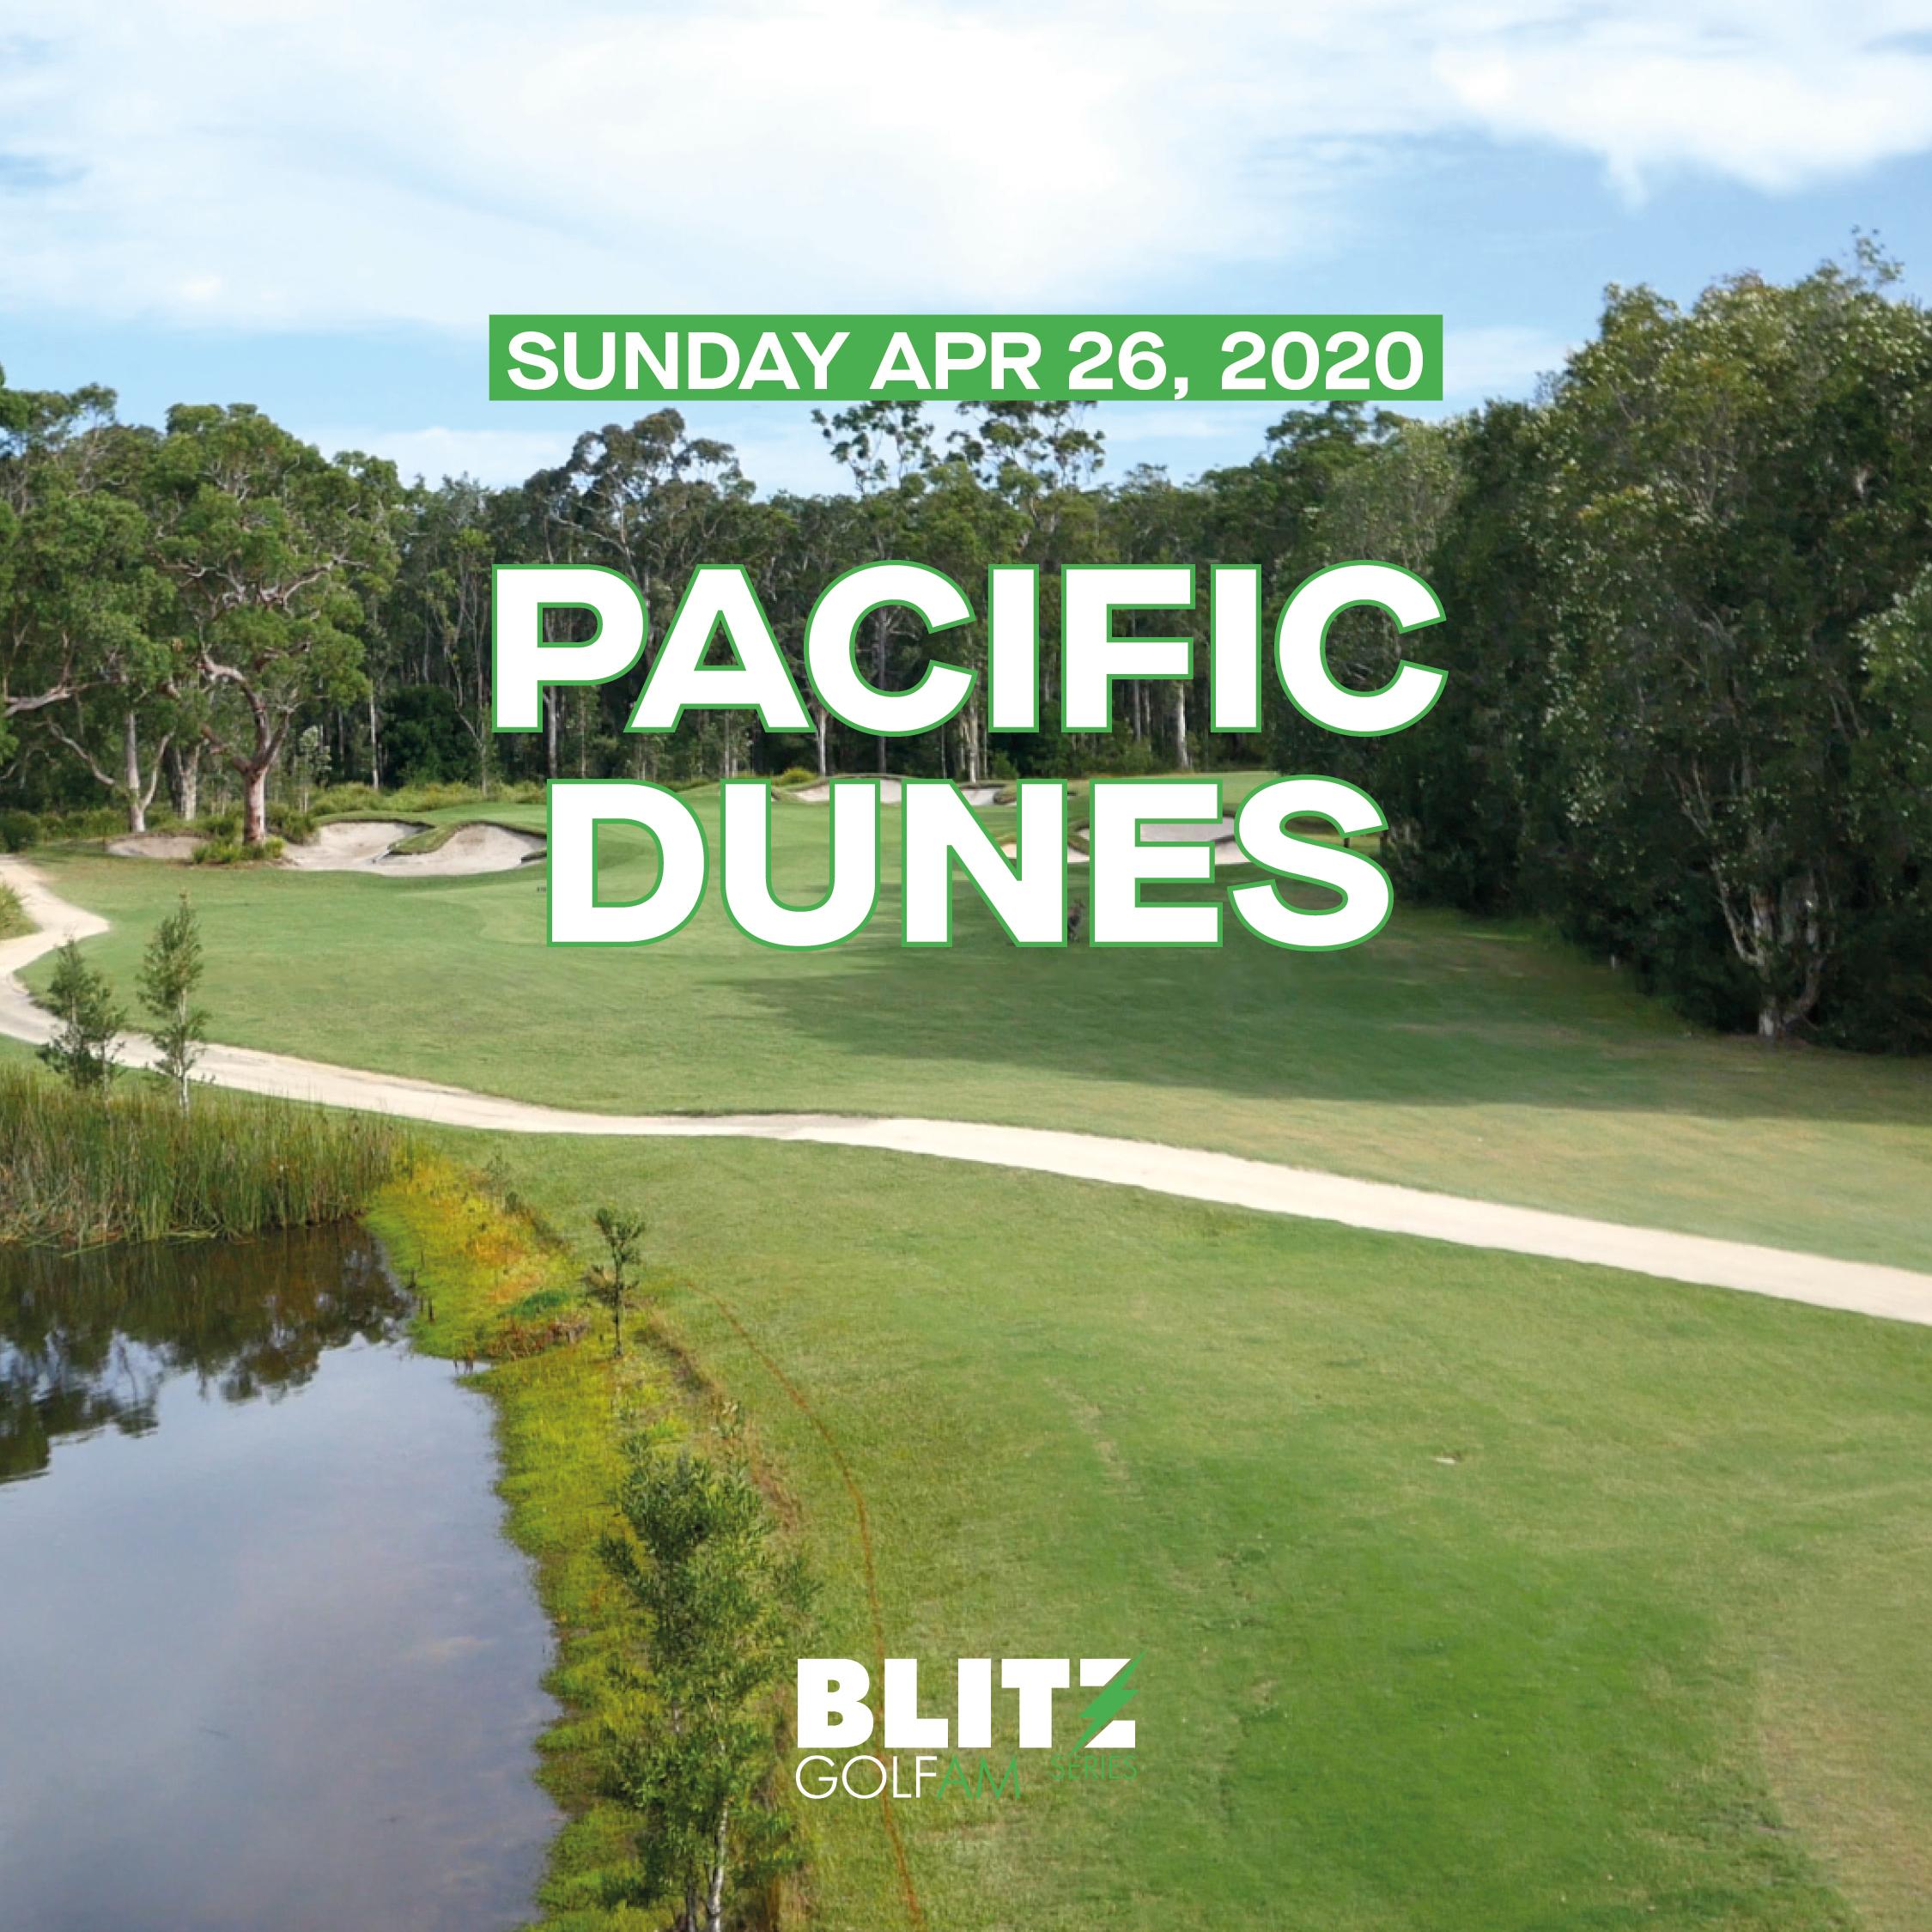 NSWACT_Pacific Dunes_Blitz 2020_AM Series Launch_260420.jpg